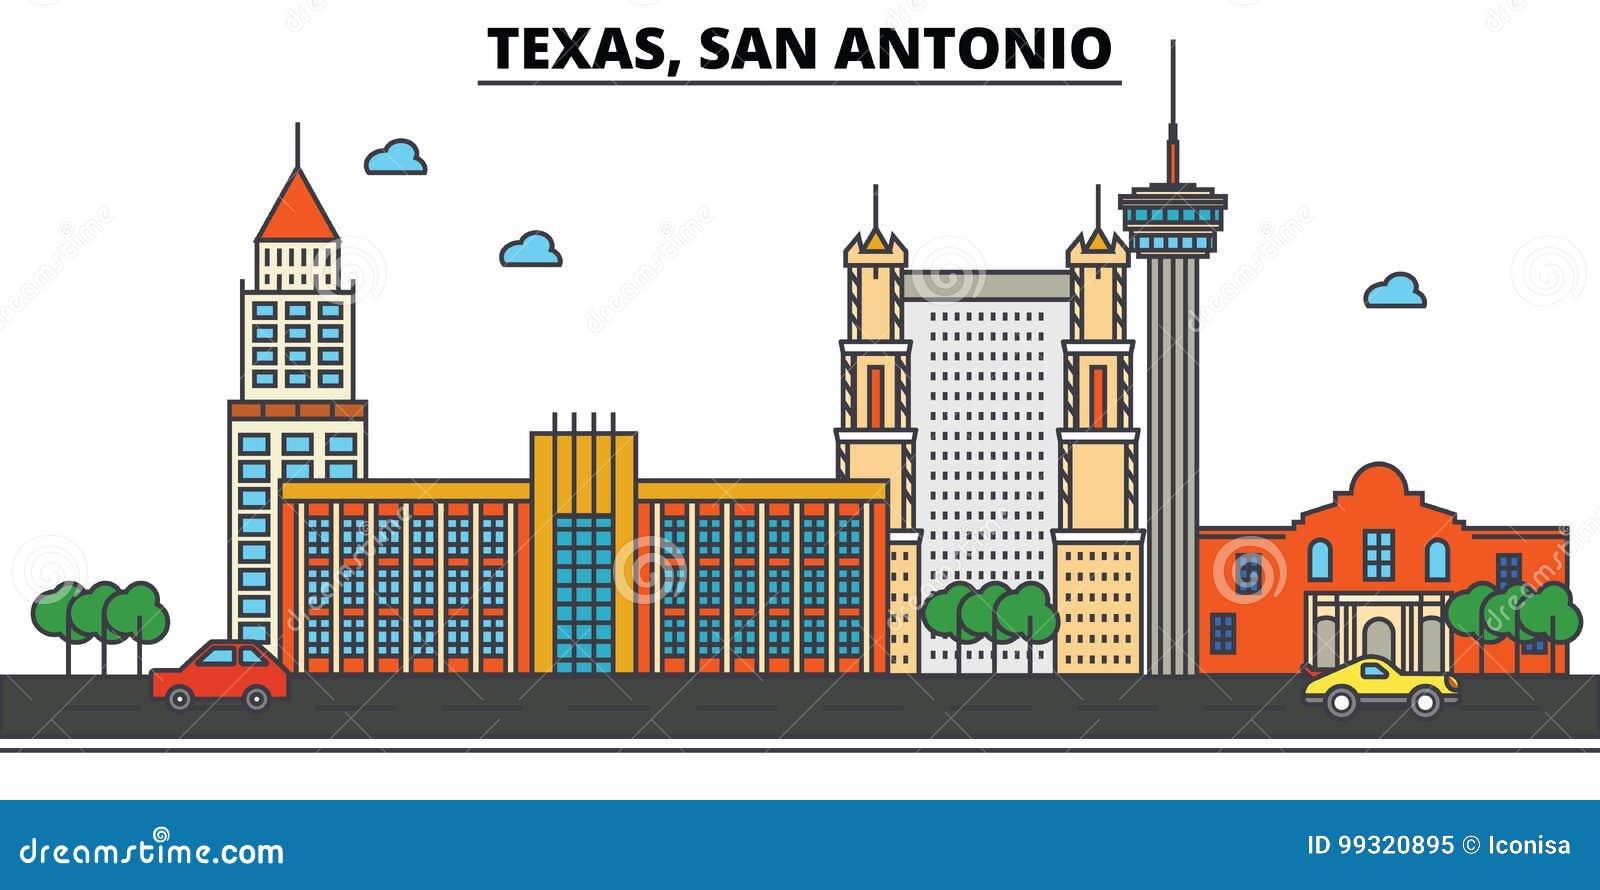 Texas, San Antonio Skyline da cidade